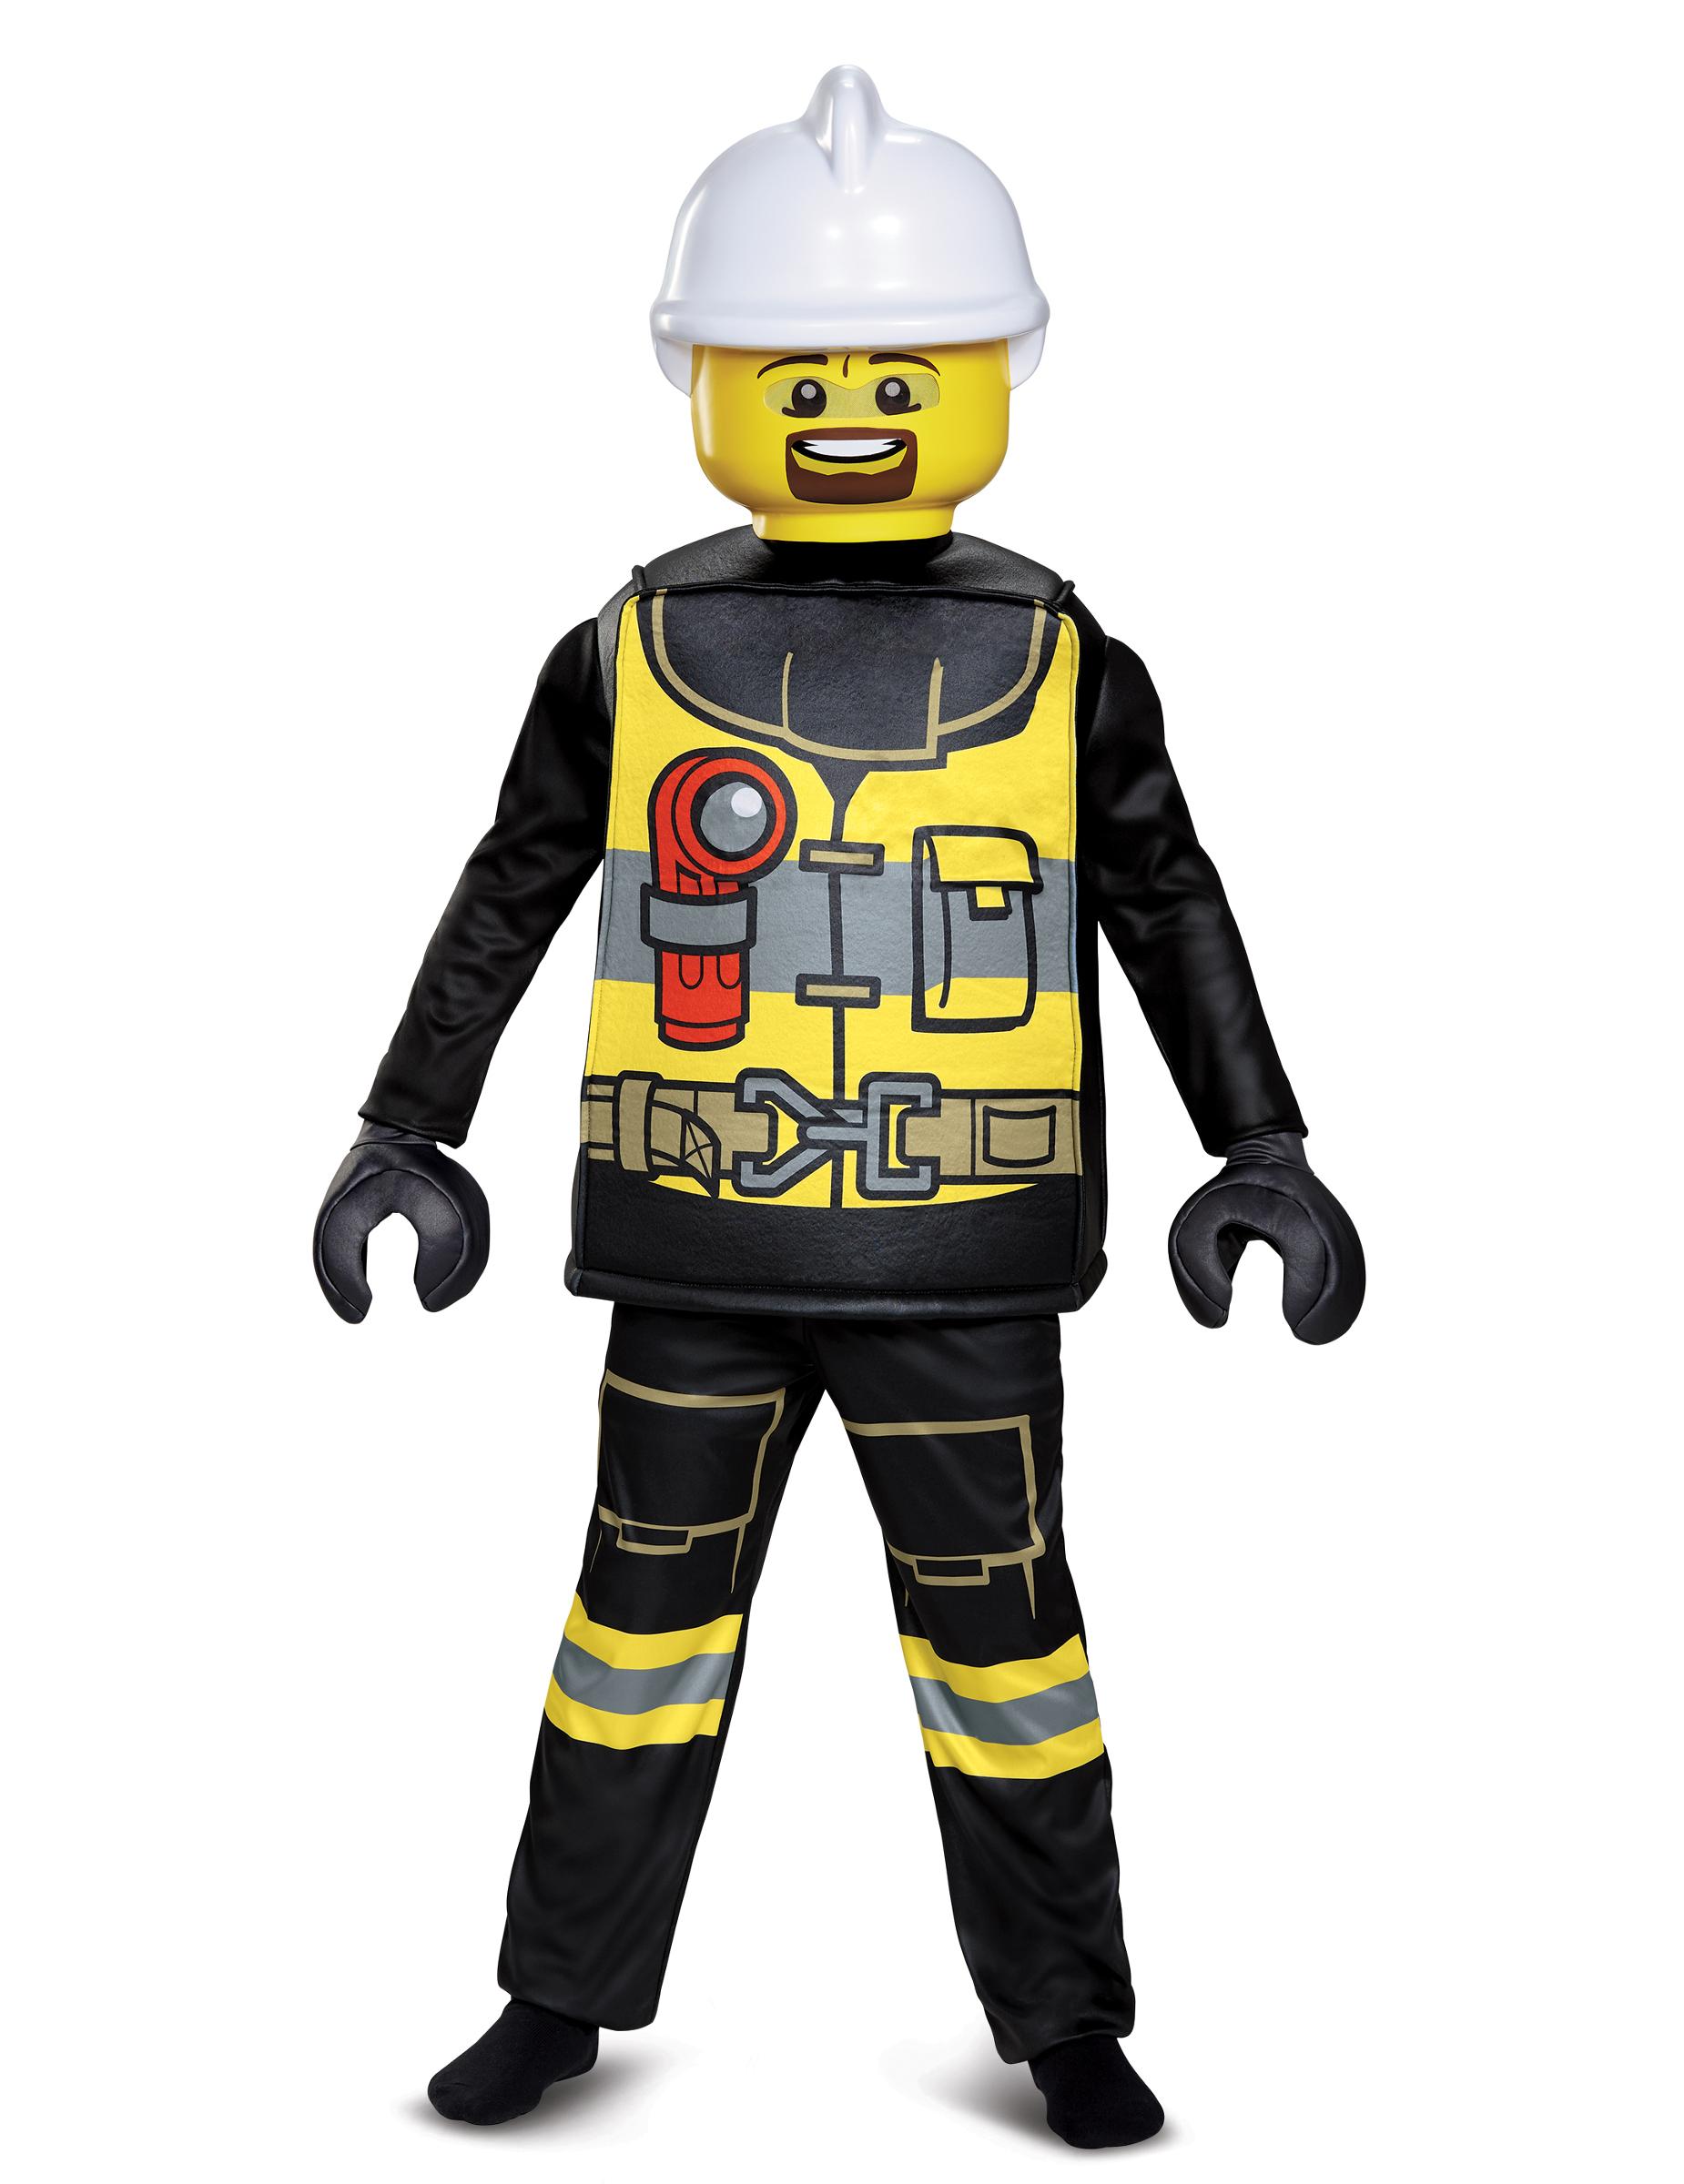 Feuerwehrmann Lego Deluxe Kostum Fur Kinder Bunt Gunstige